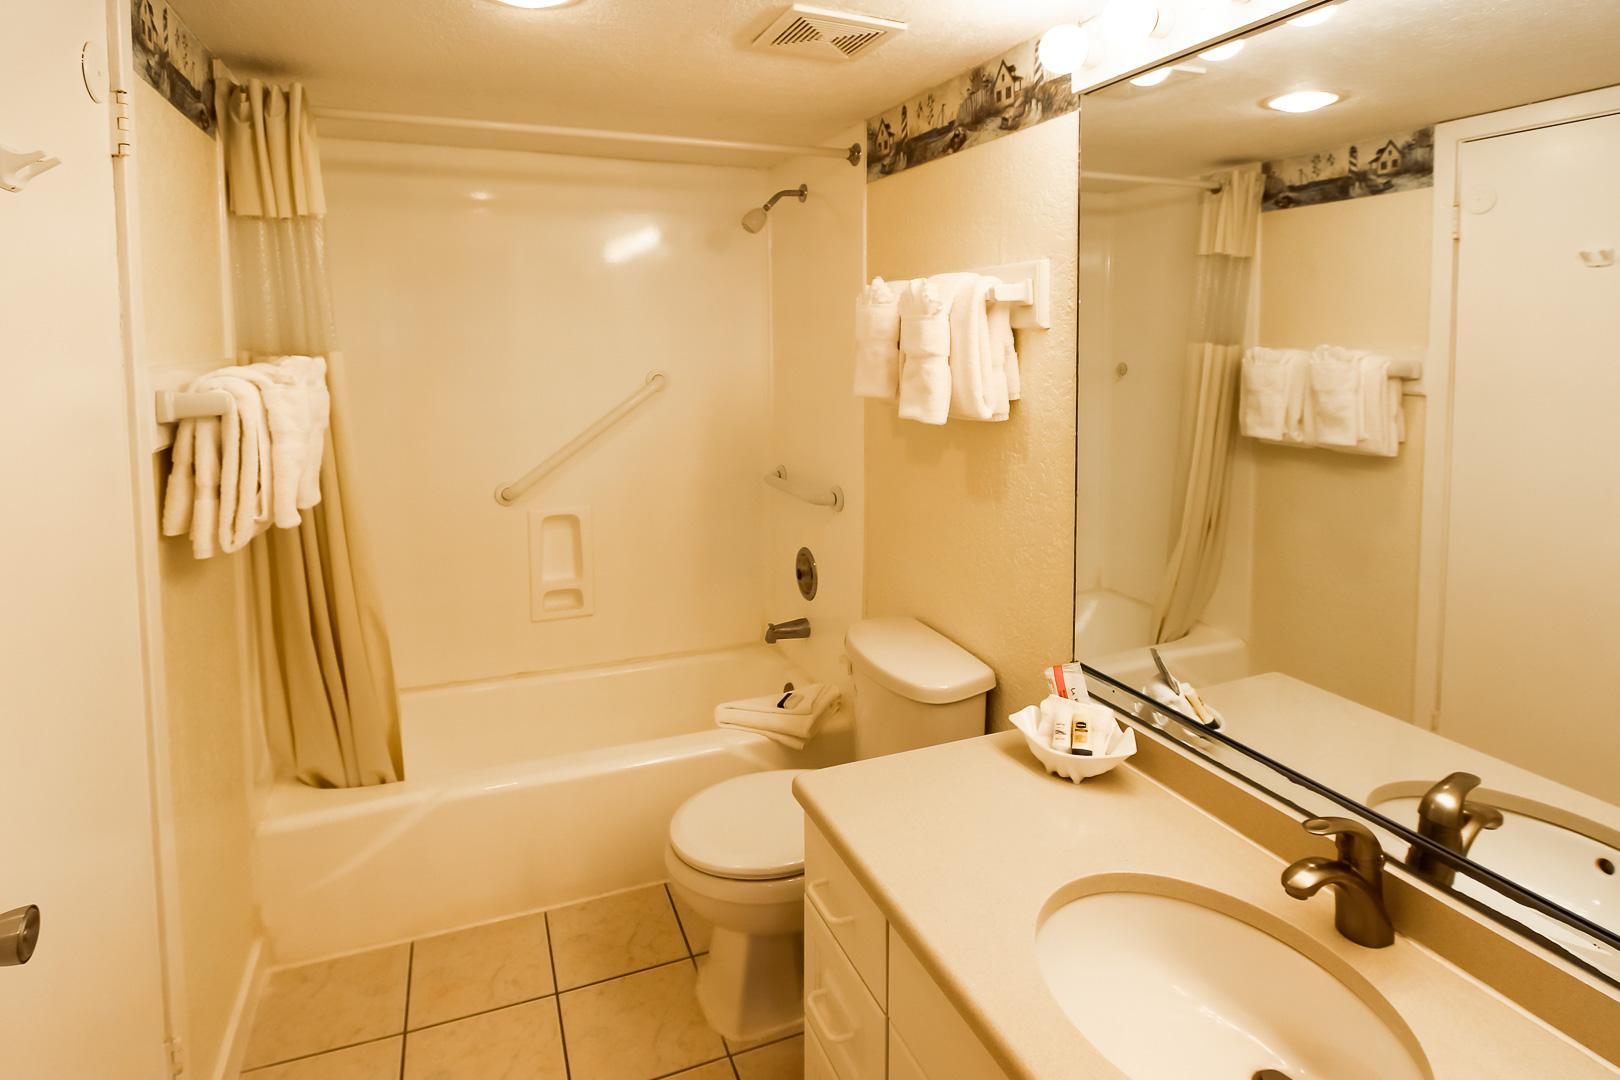 A clean bathroom at VRI's Players Club Resort in Hilton Head Island, South Carolina.